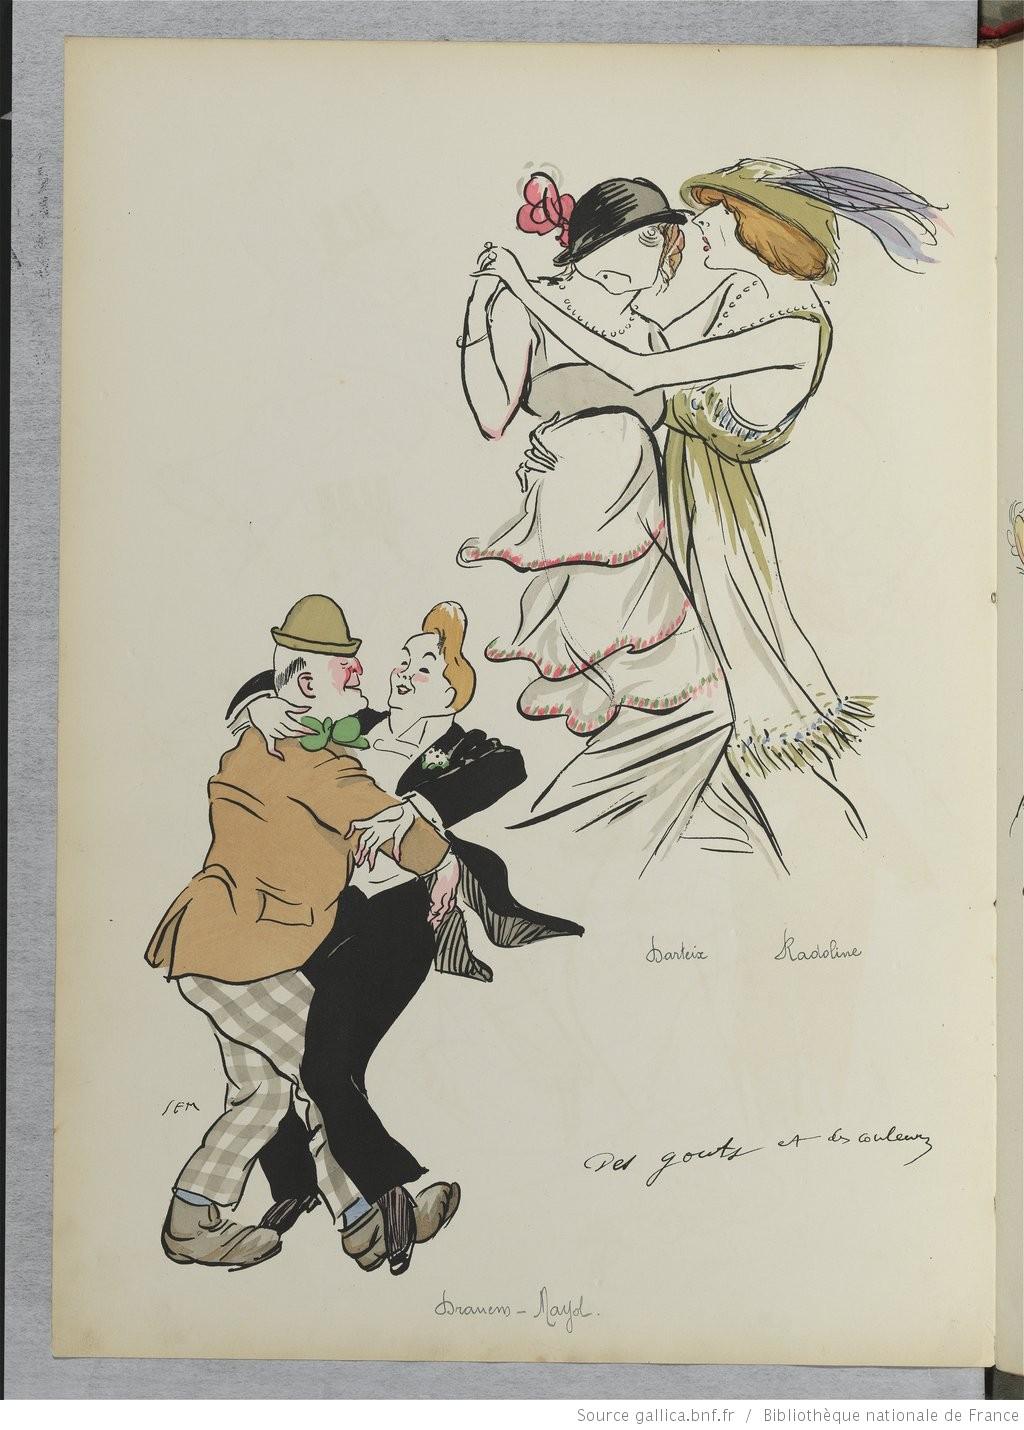 tangoville___caricatures___sem__btv1b52501948b-2